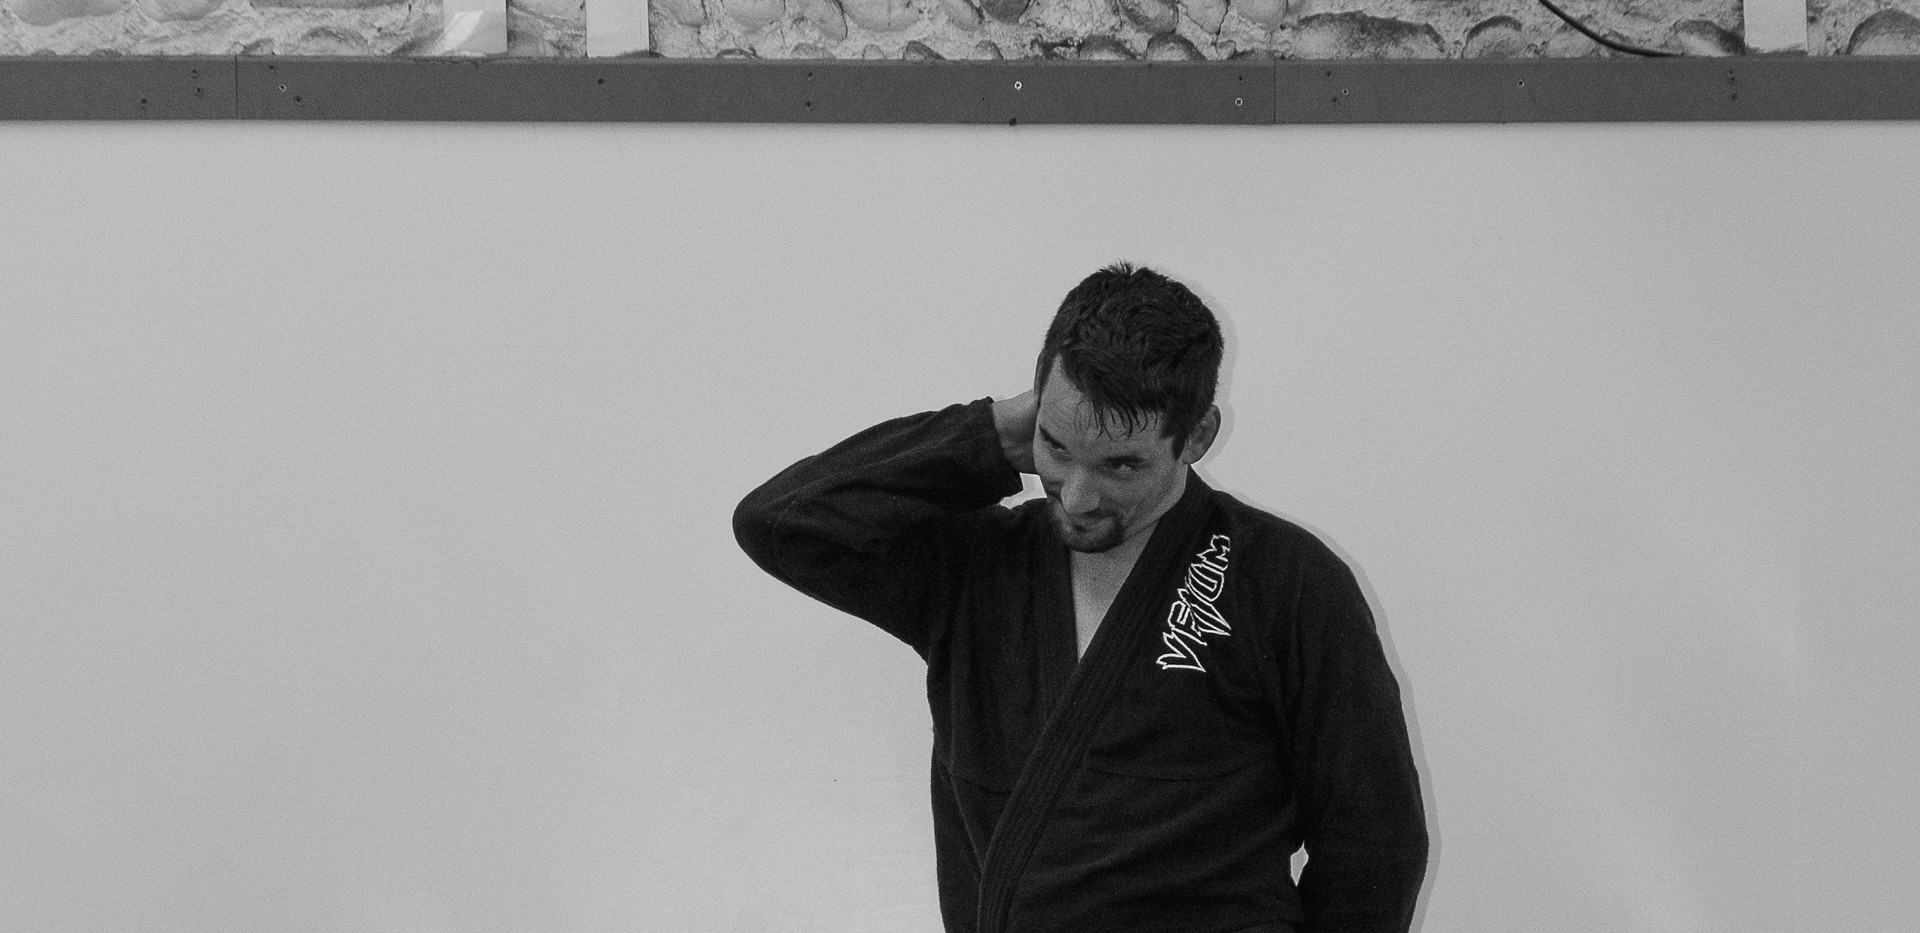 Aranha Black and brown belt